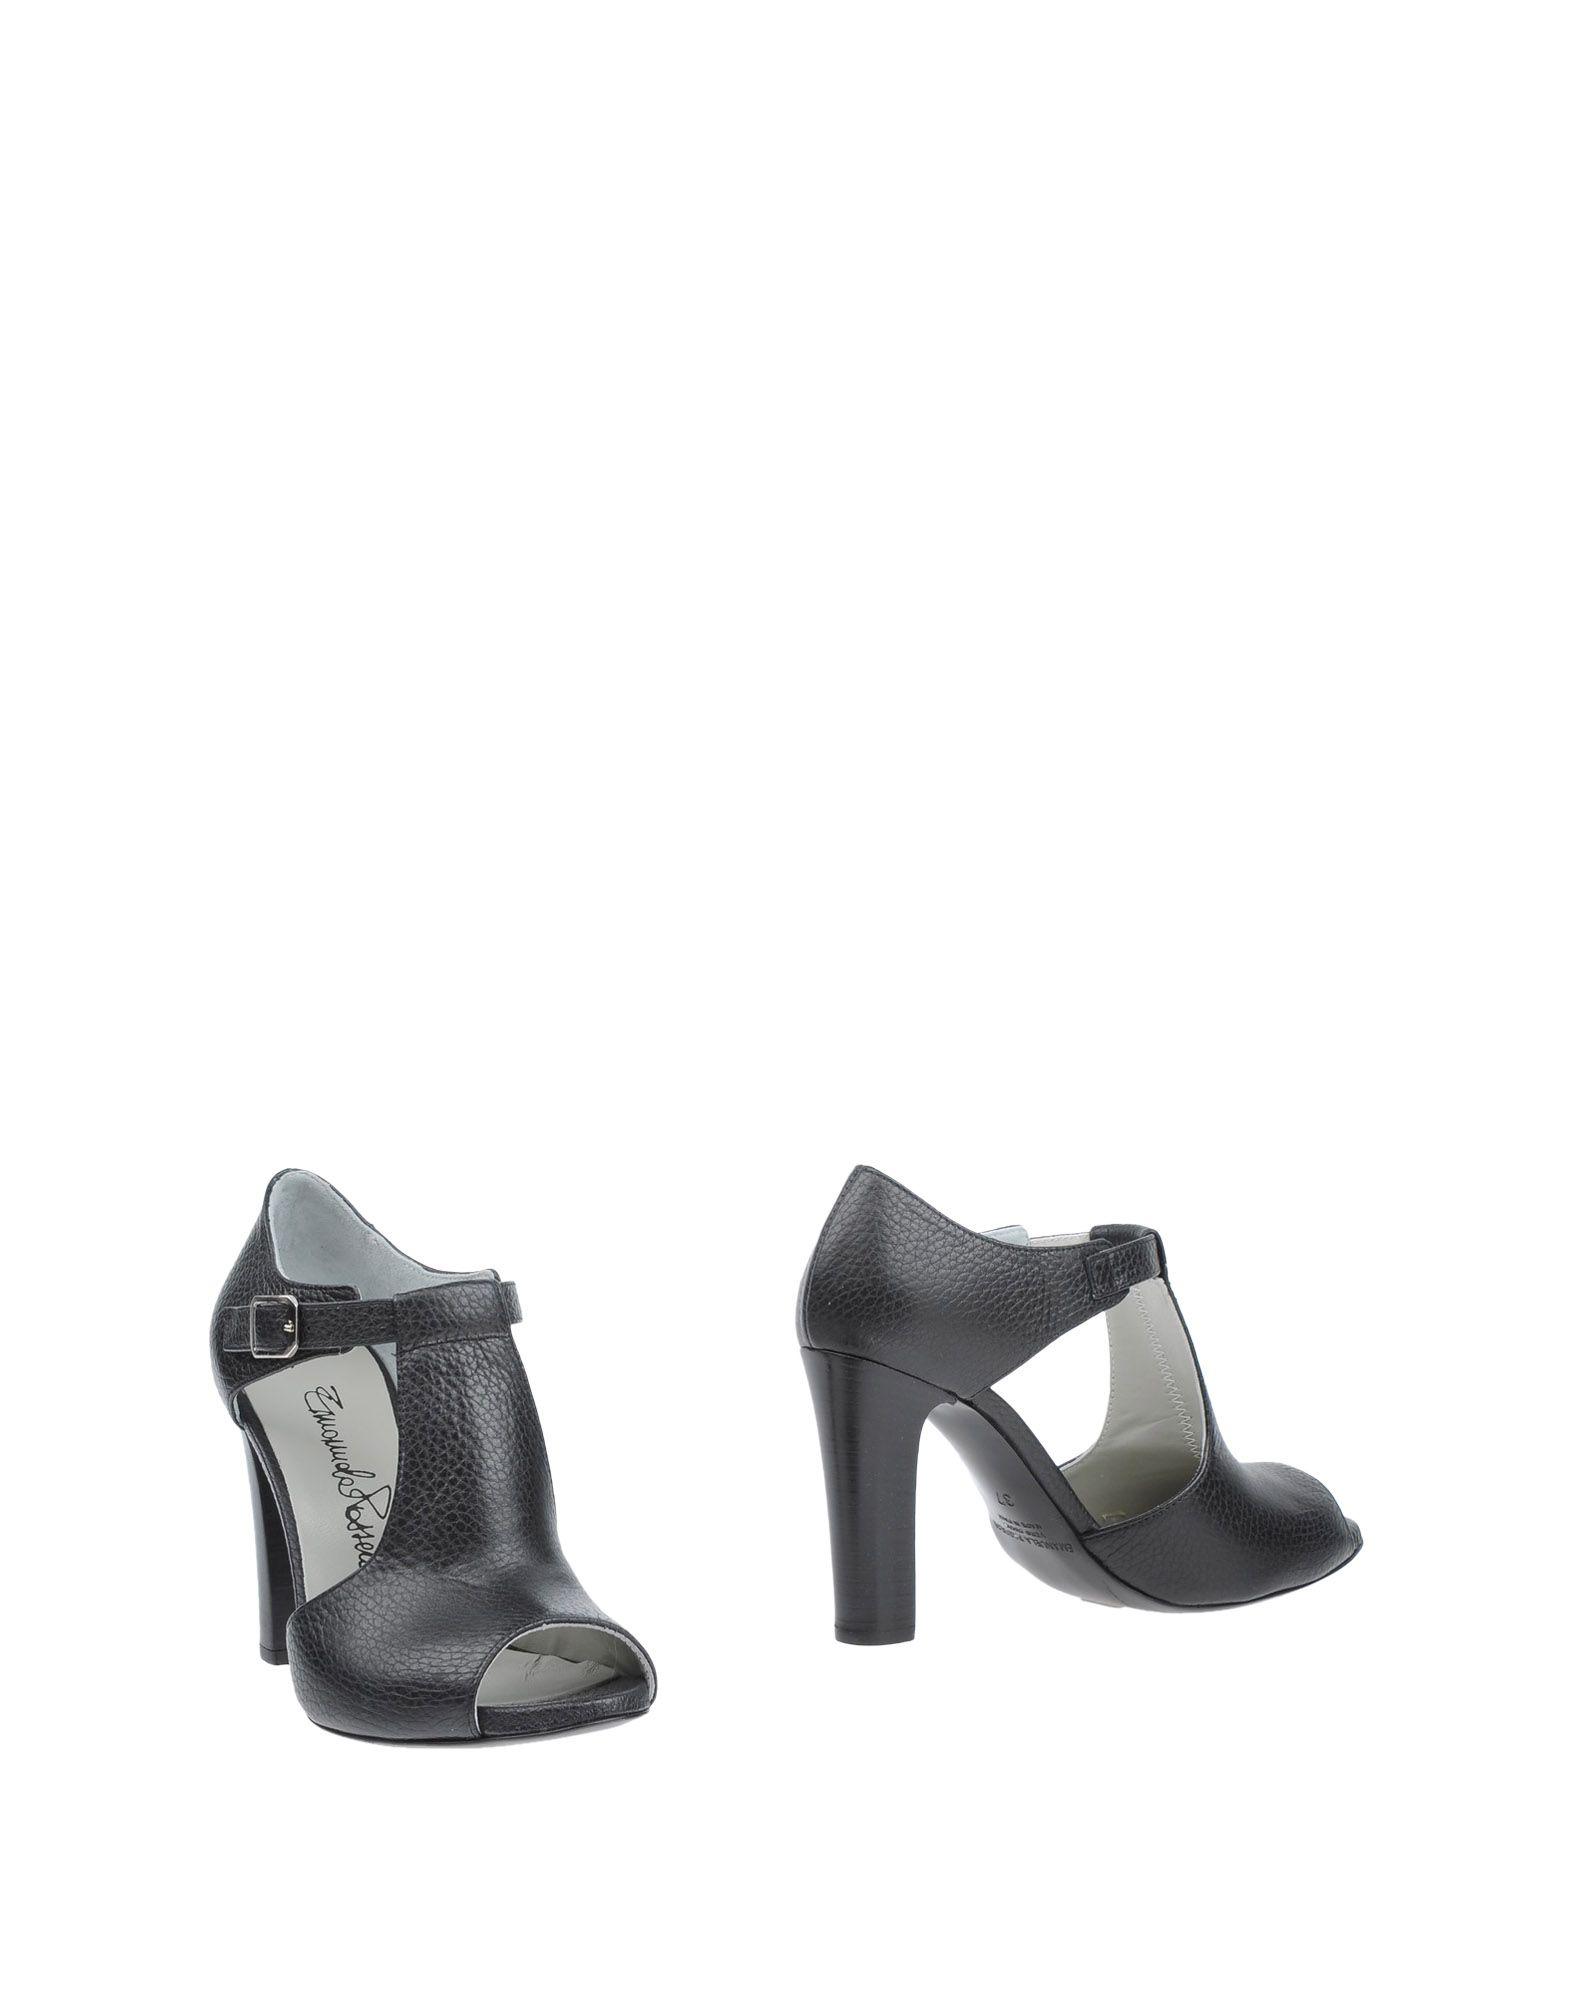 Emanuela Passeri Ankle Boot - Women online Emanuela Passeri Ankle Boots online Women on  Australia - 11331825TF 91d854